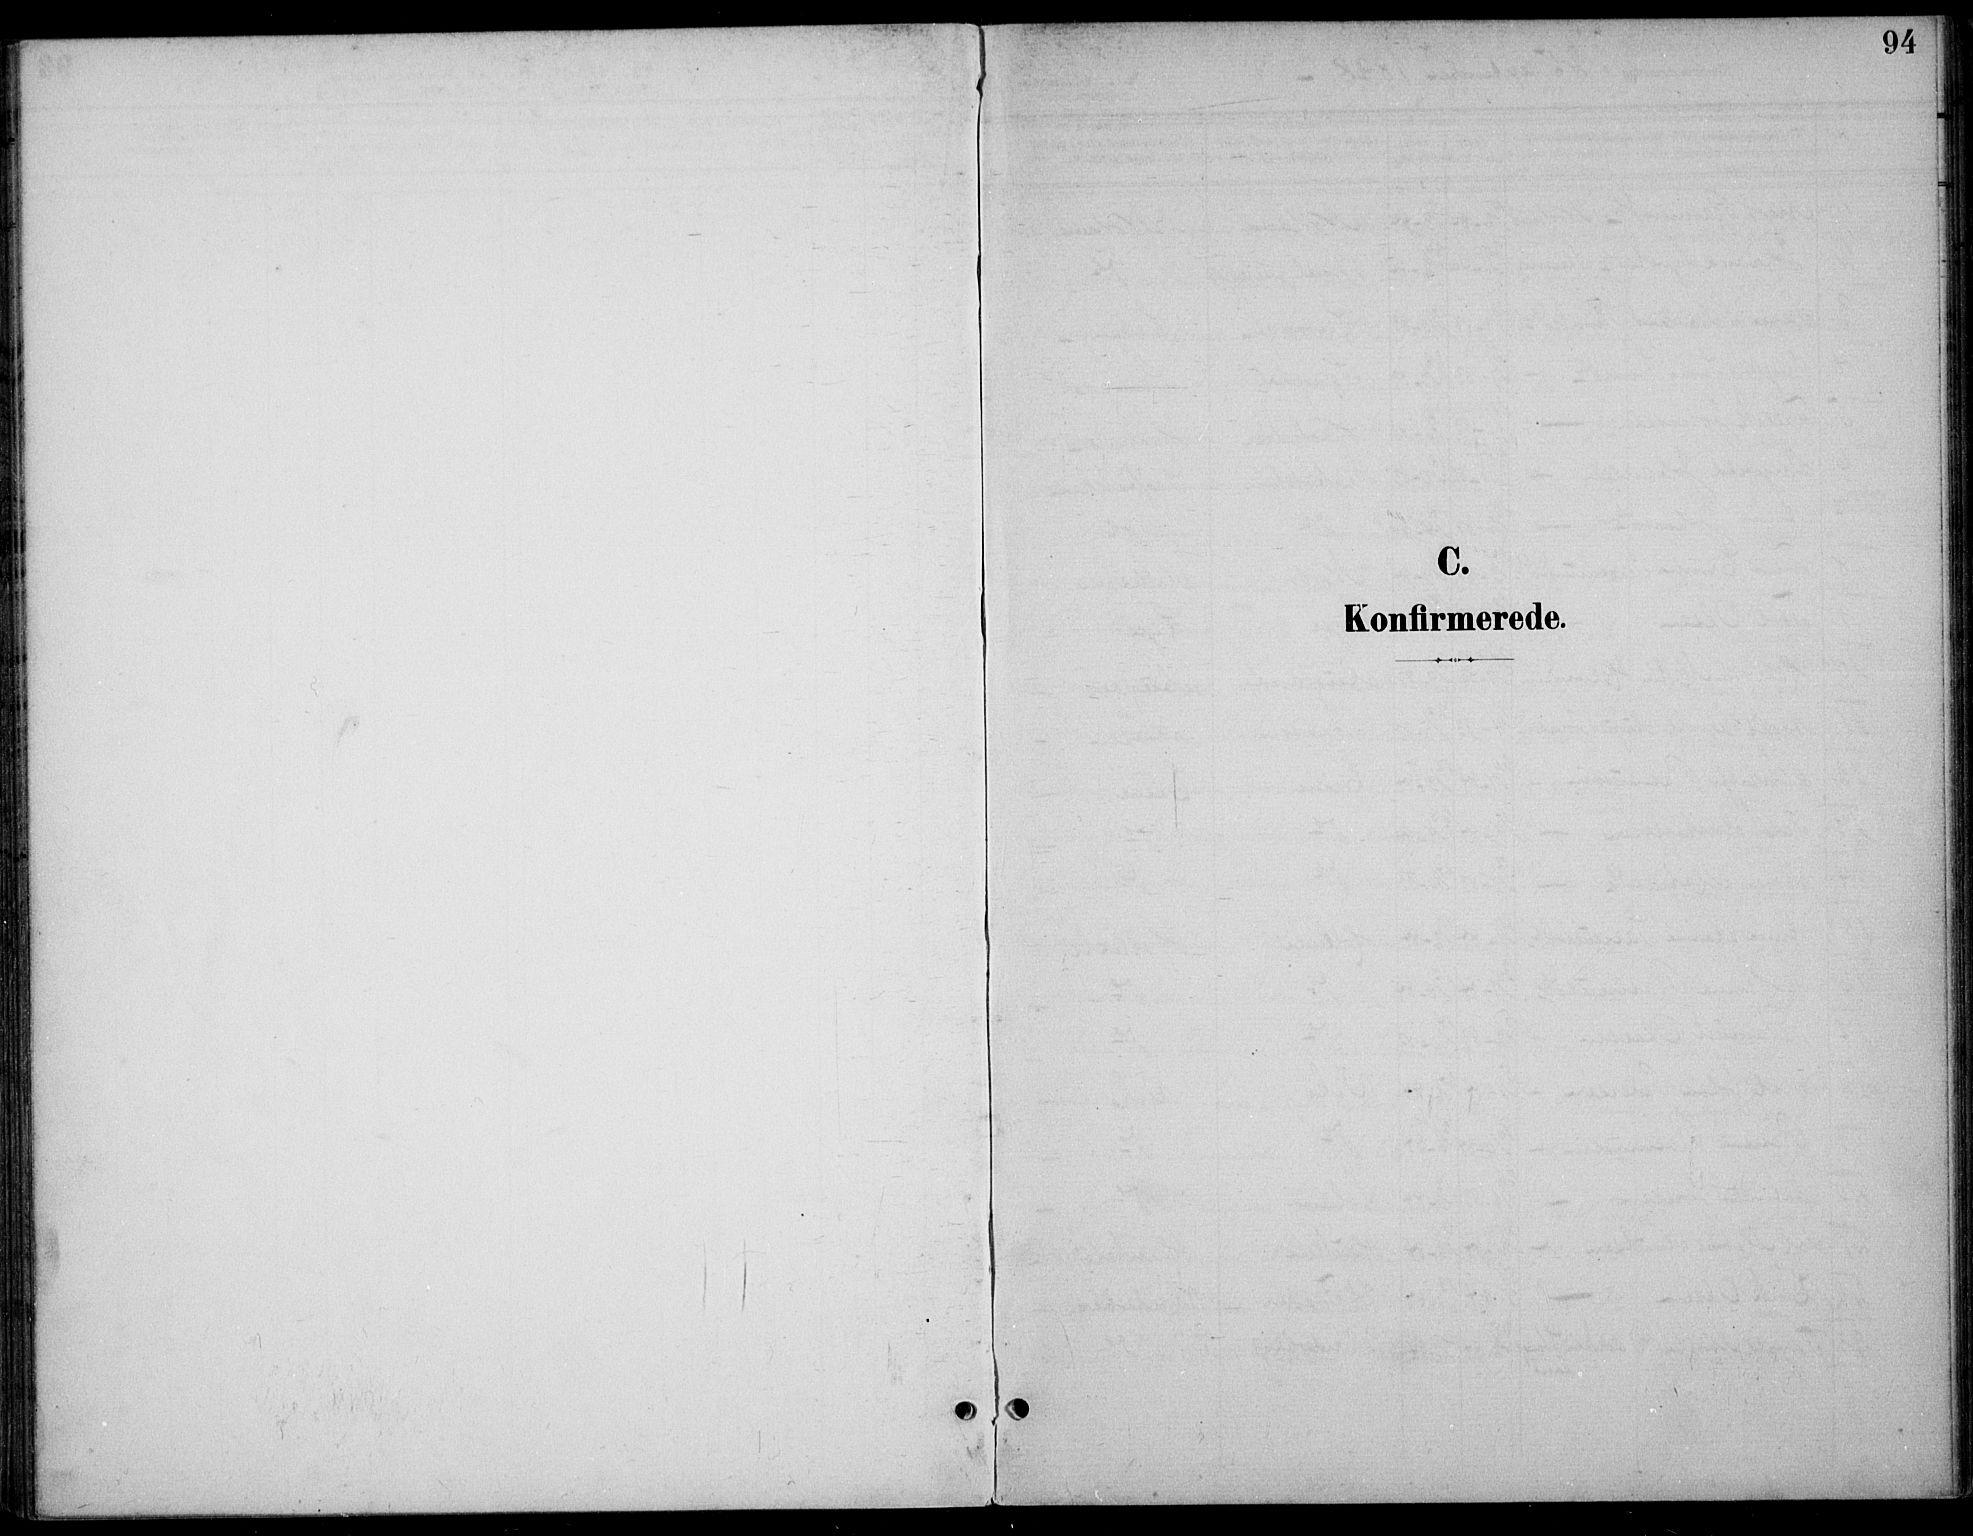 SAST, Høgsfjord sokneprestkontor, H/Ha/Haa/L0007: Ministerialbok nr. A 7, 1898-1917, s. 94